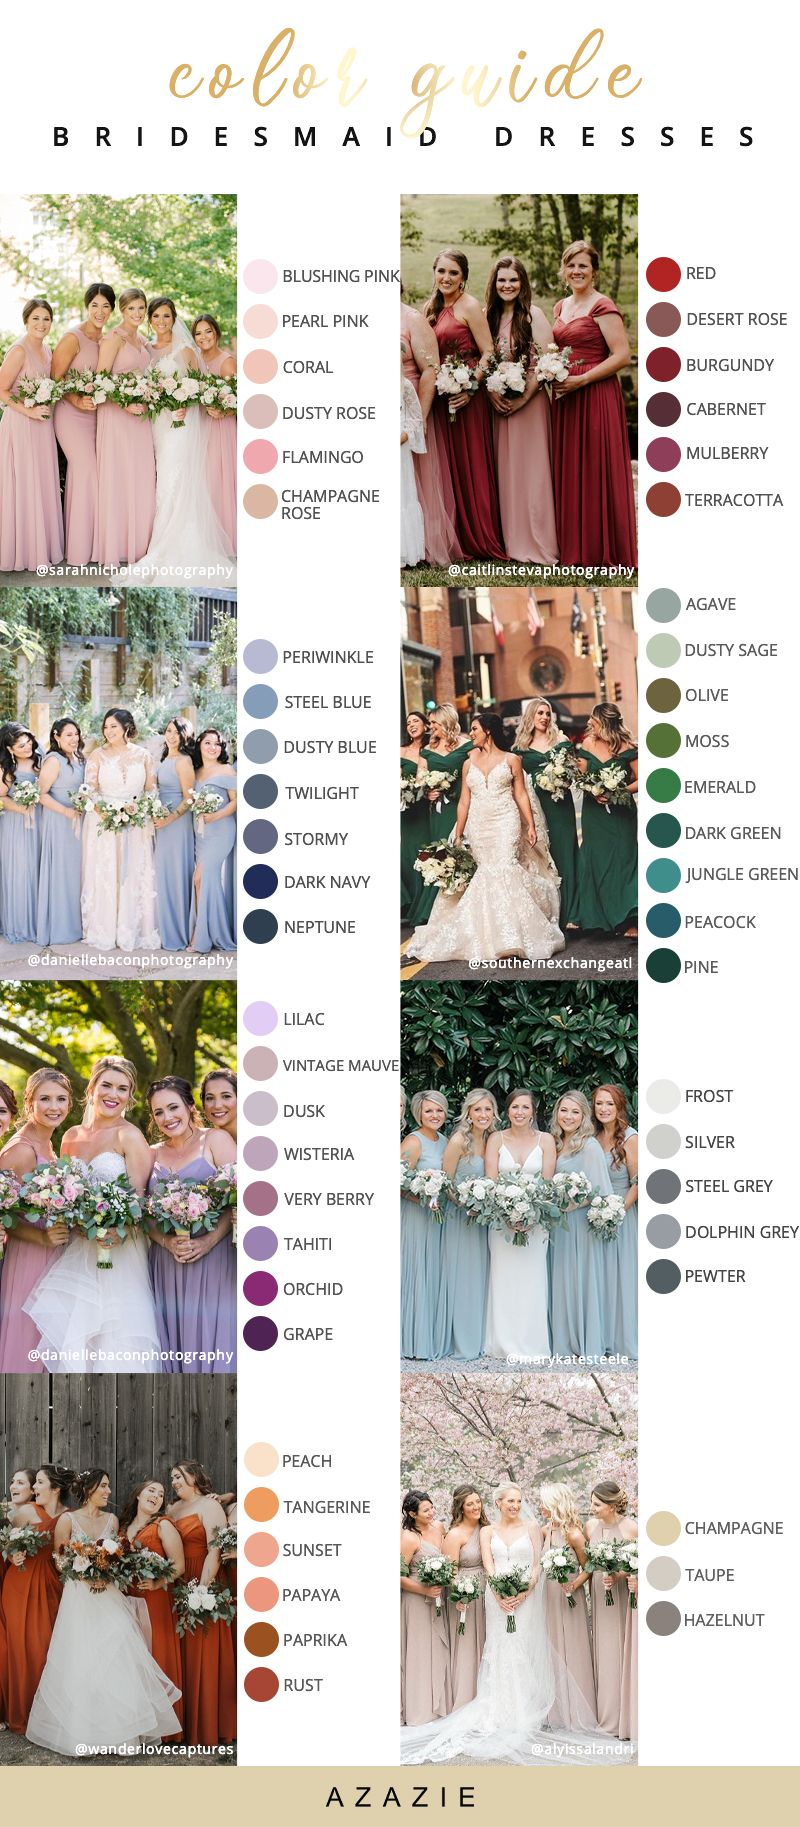 Elegant Spring Summer Bridesmaid Dresses Summer Bridesmaid Dresses Bridesmaid Dress Colors Wedding Bridesmaid Dresses [ 1827 x 800 Pixel ]